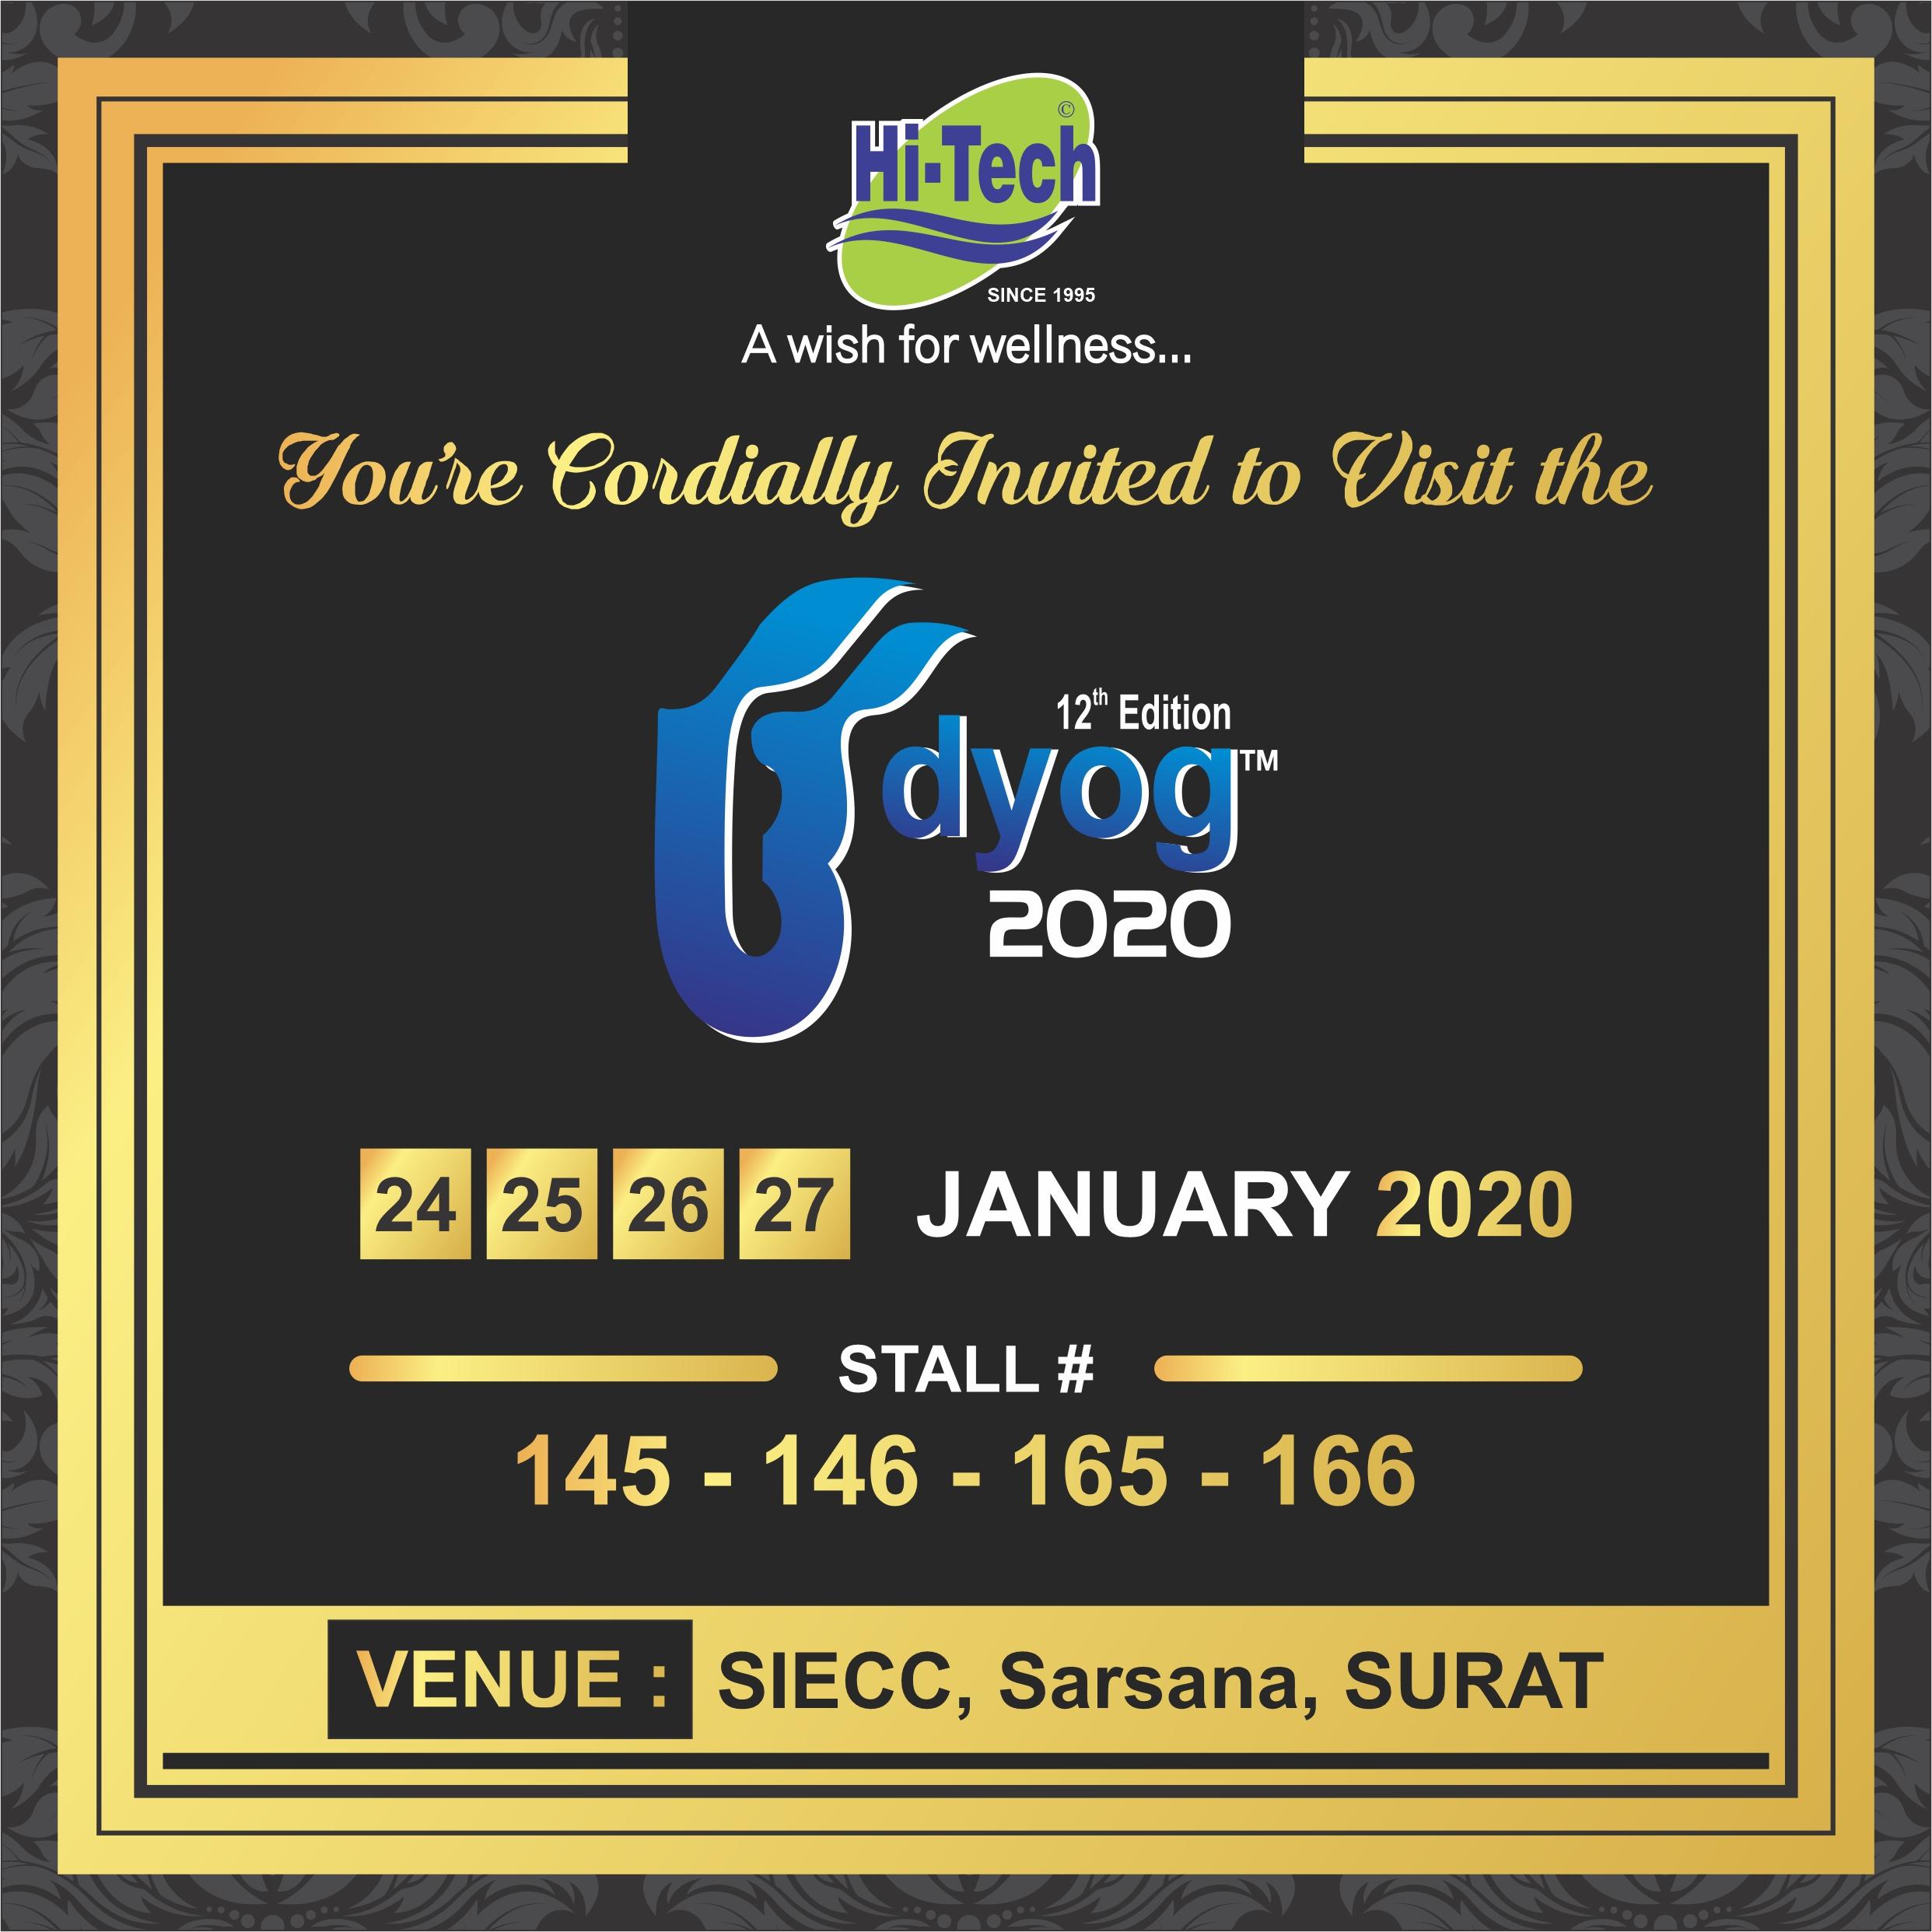 Udyog 12th Edition Exhibition Surat